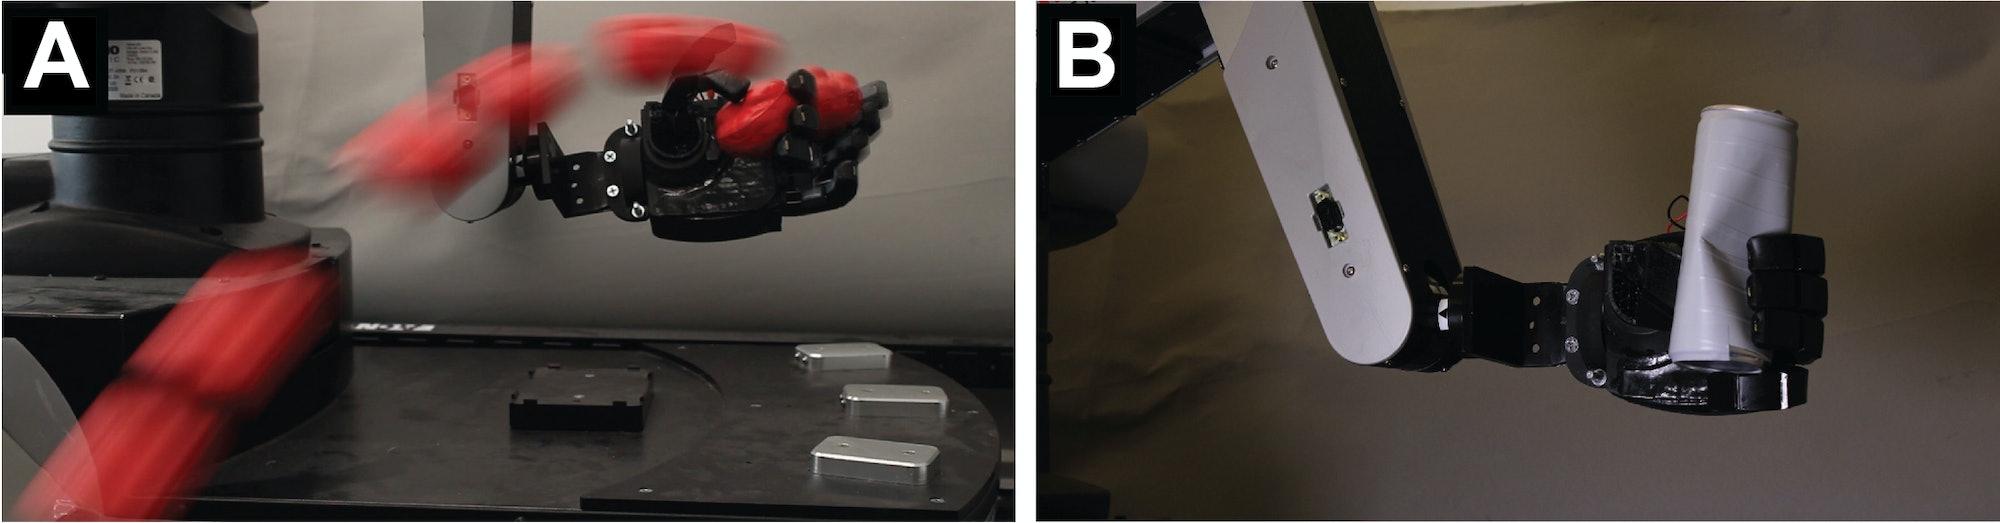 robotic hand catching ball crushing can